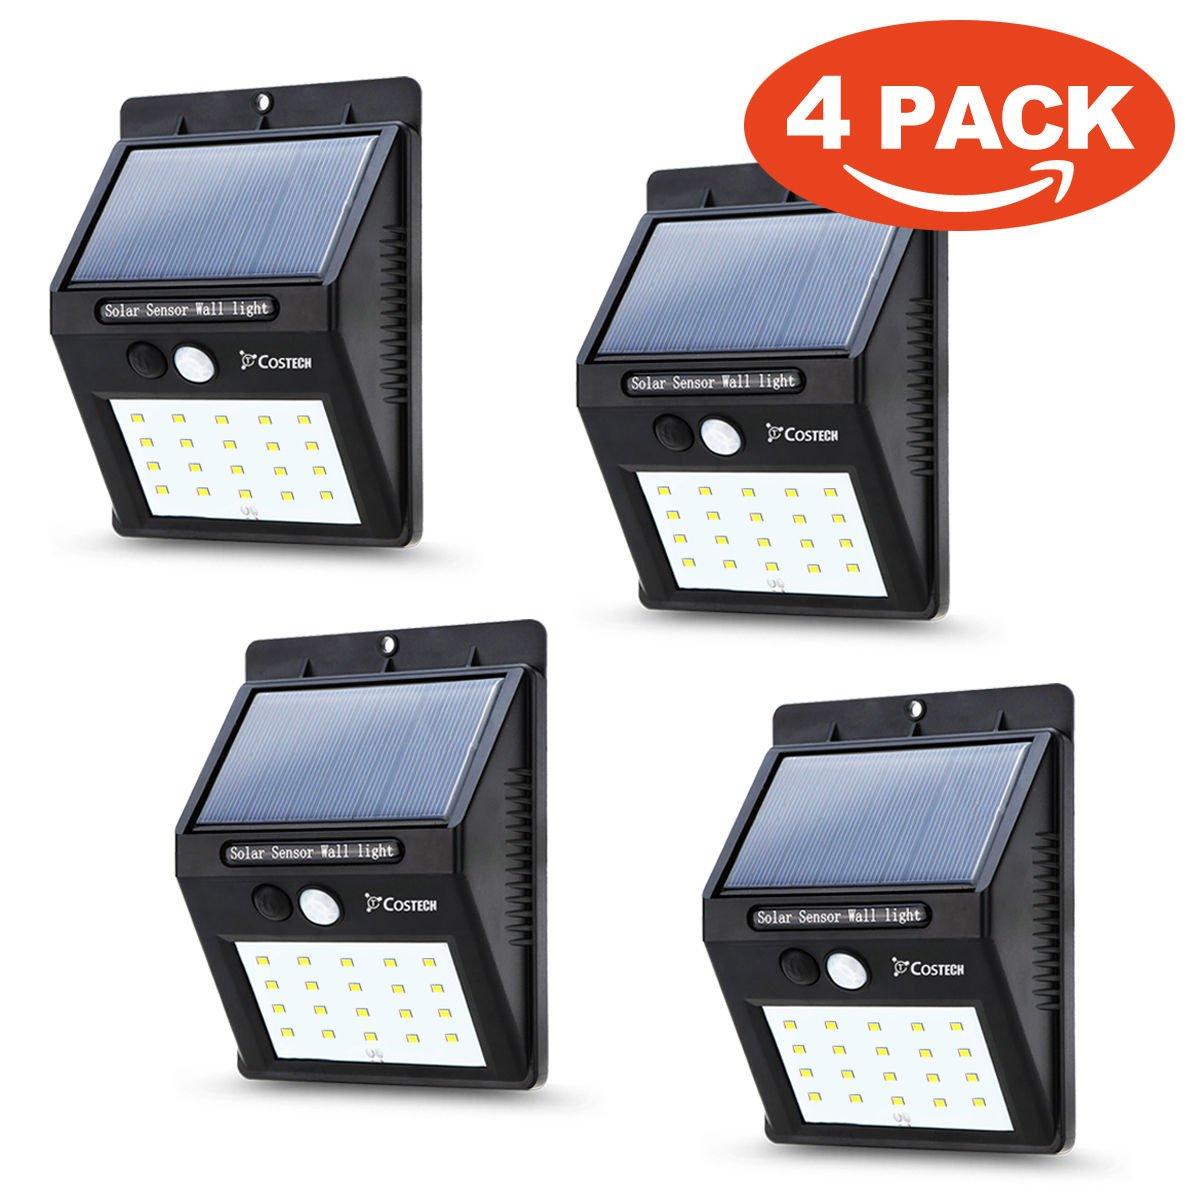 4 Pack 20 Bright LEDsSolar Power Sensor Wall Light wireless solar powered motion sensor light Security Weatherproof Outdoor Lamp